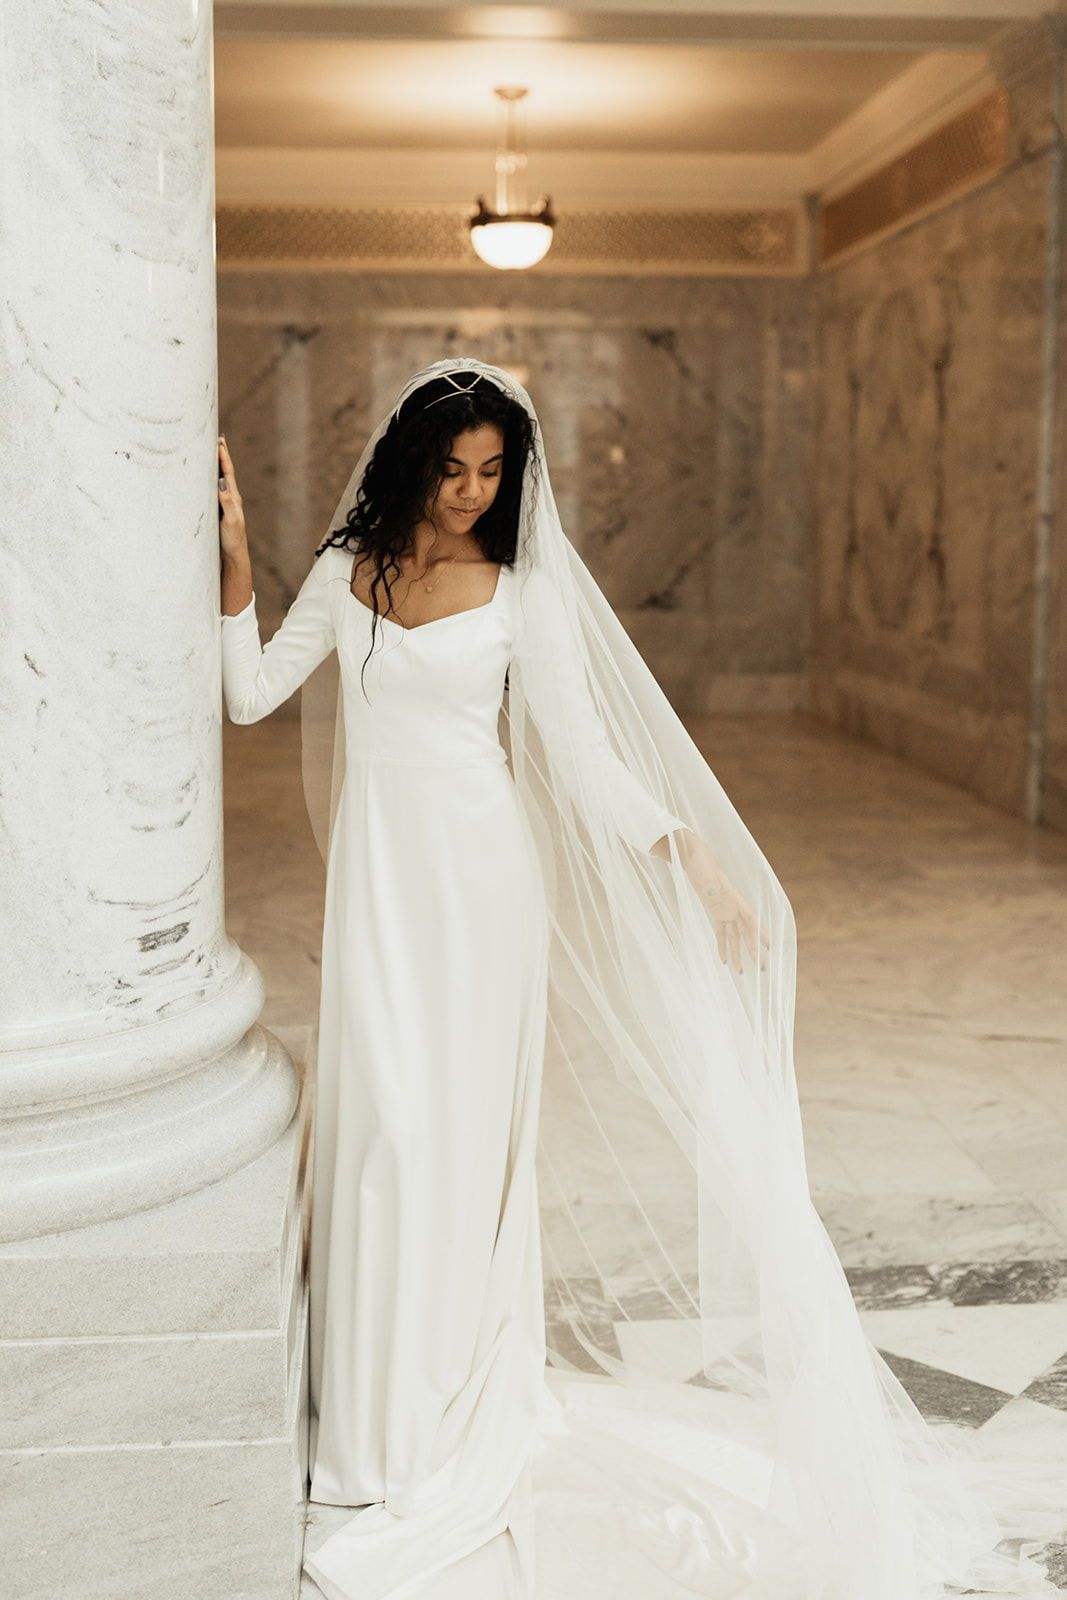 New Nekline On Modest Wedding Dress Modest Wedding Dresses Wedding Dresses Wedding Dresses Lace [ 1600 x 1067 Pixel ]